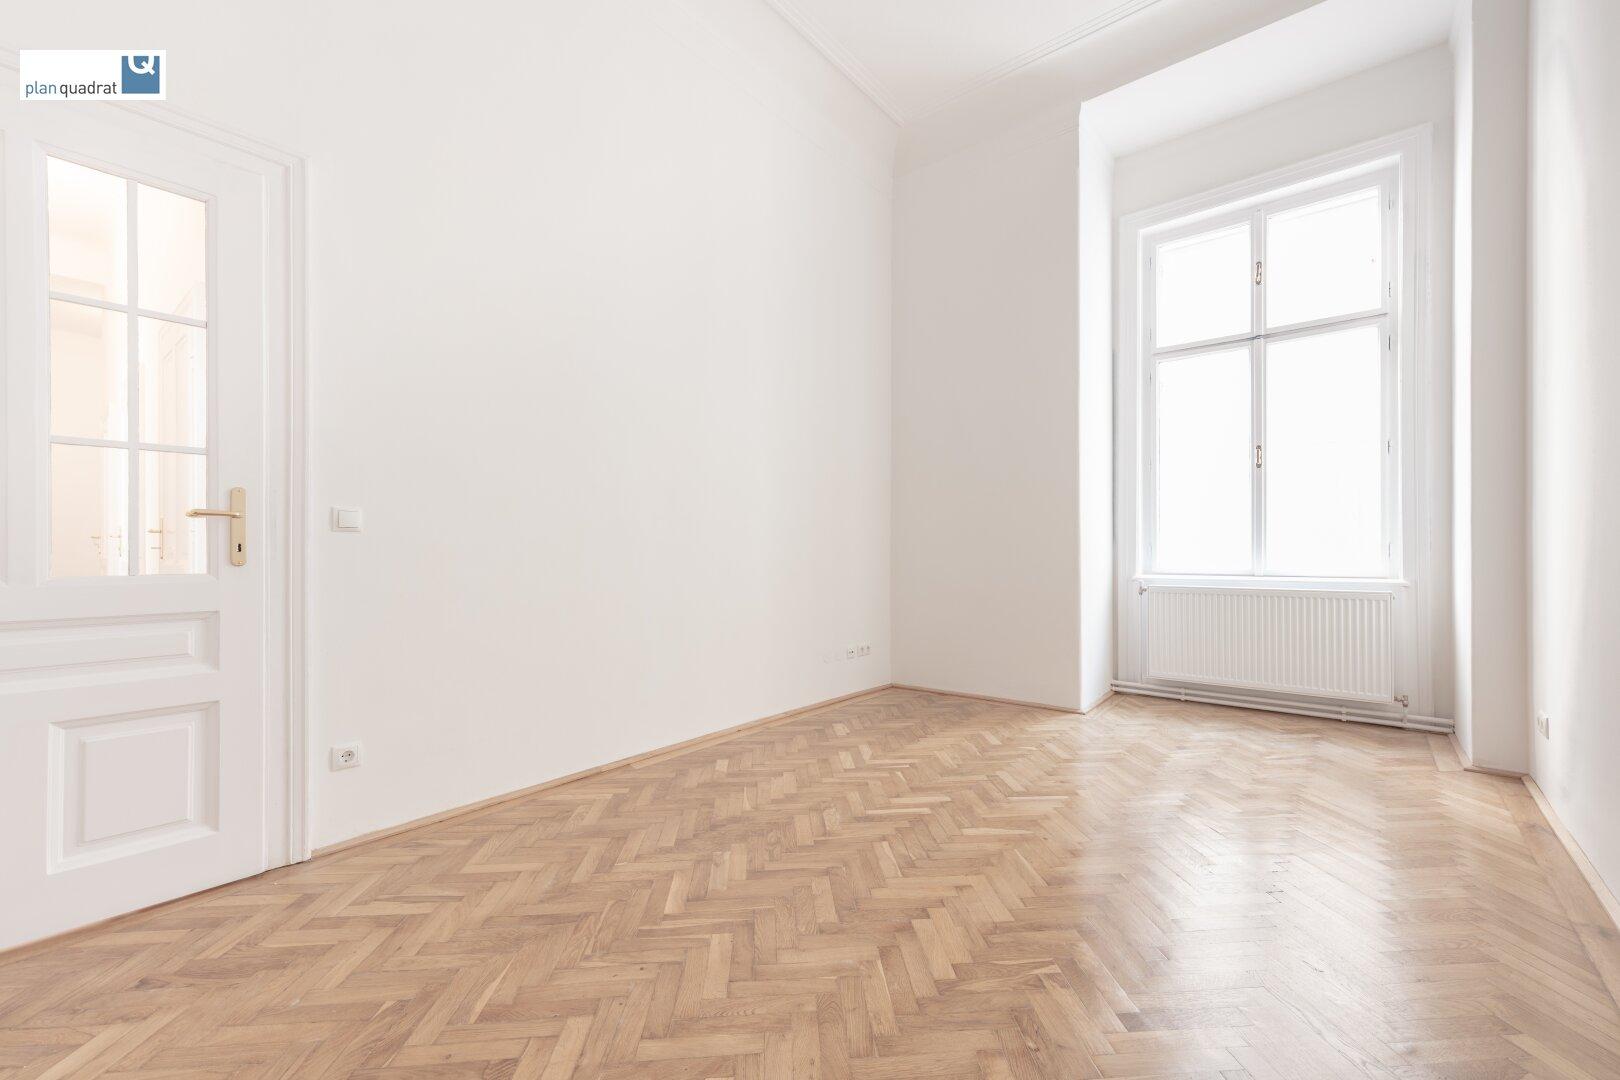 Raum 1 (gem. Grunsrissskizze - ca. 15,90 qm)